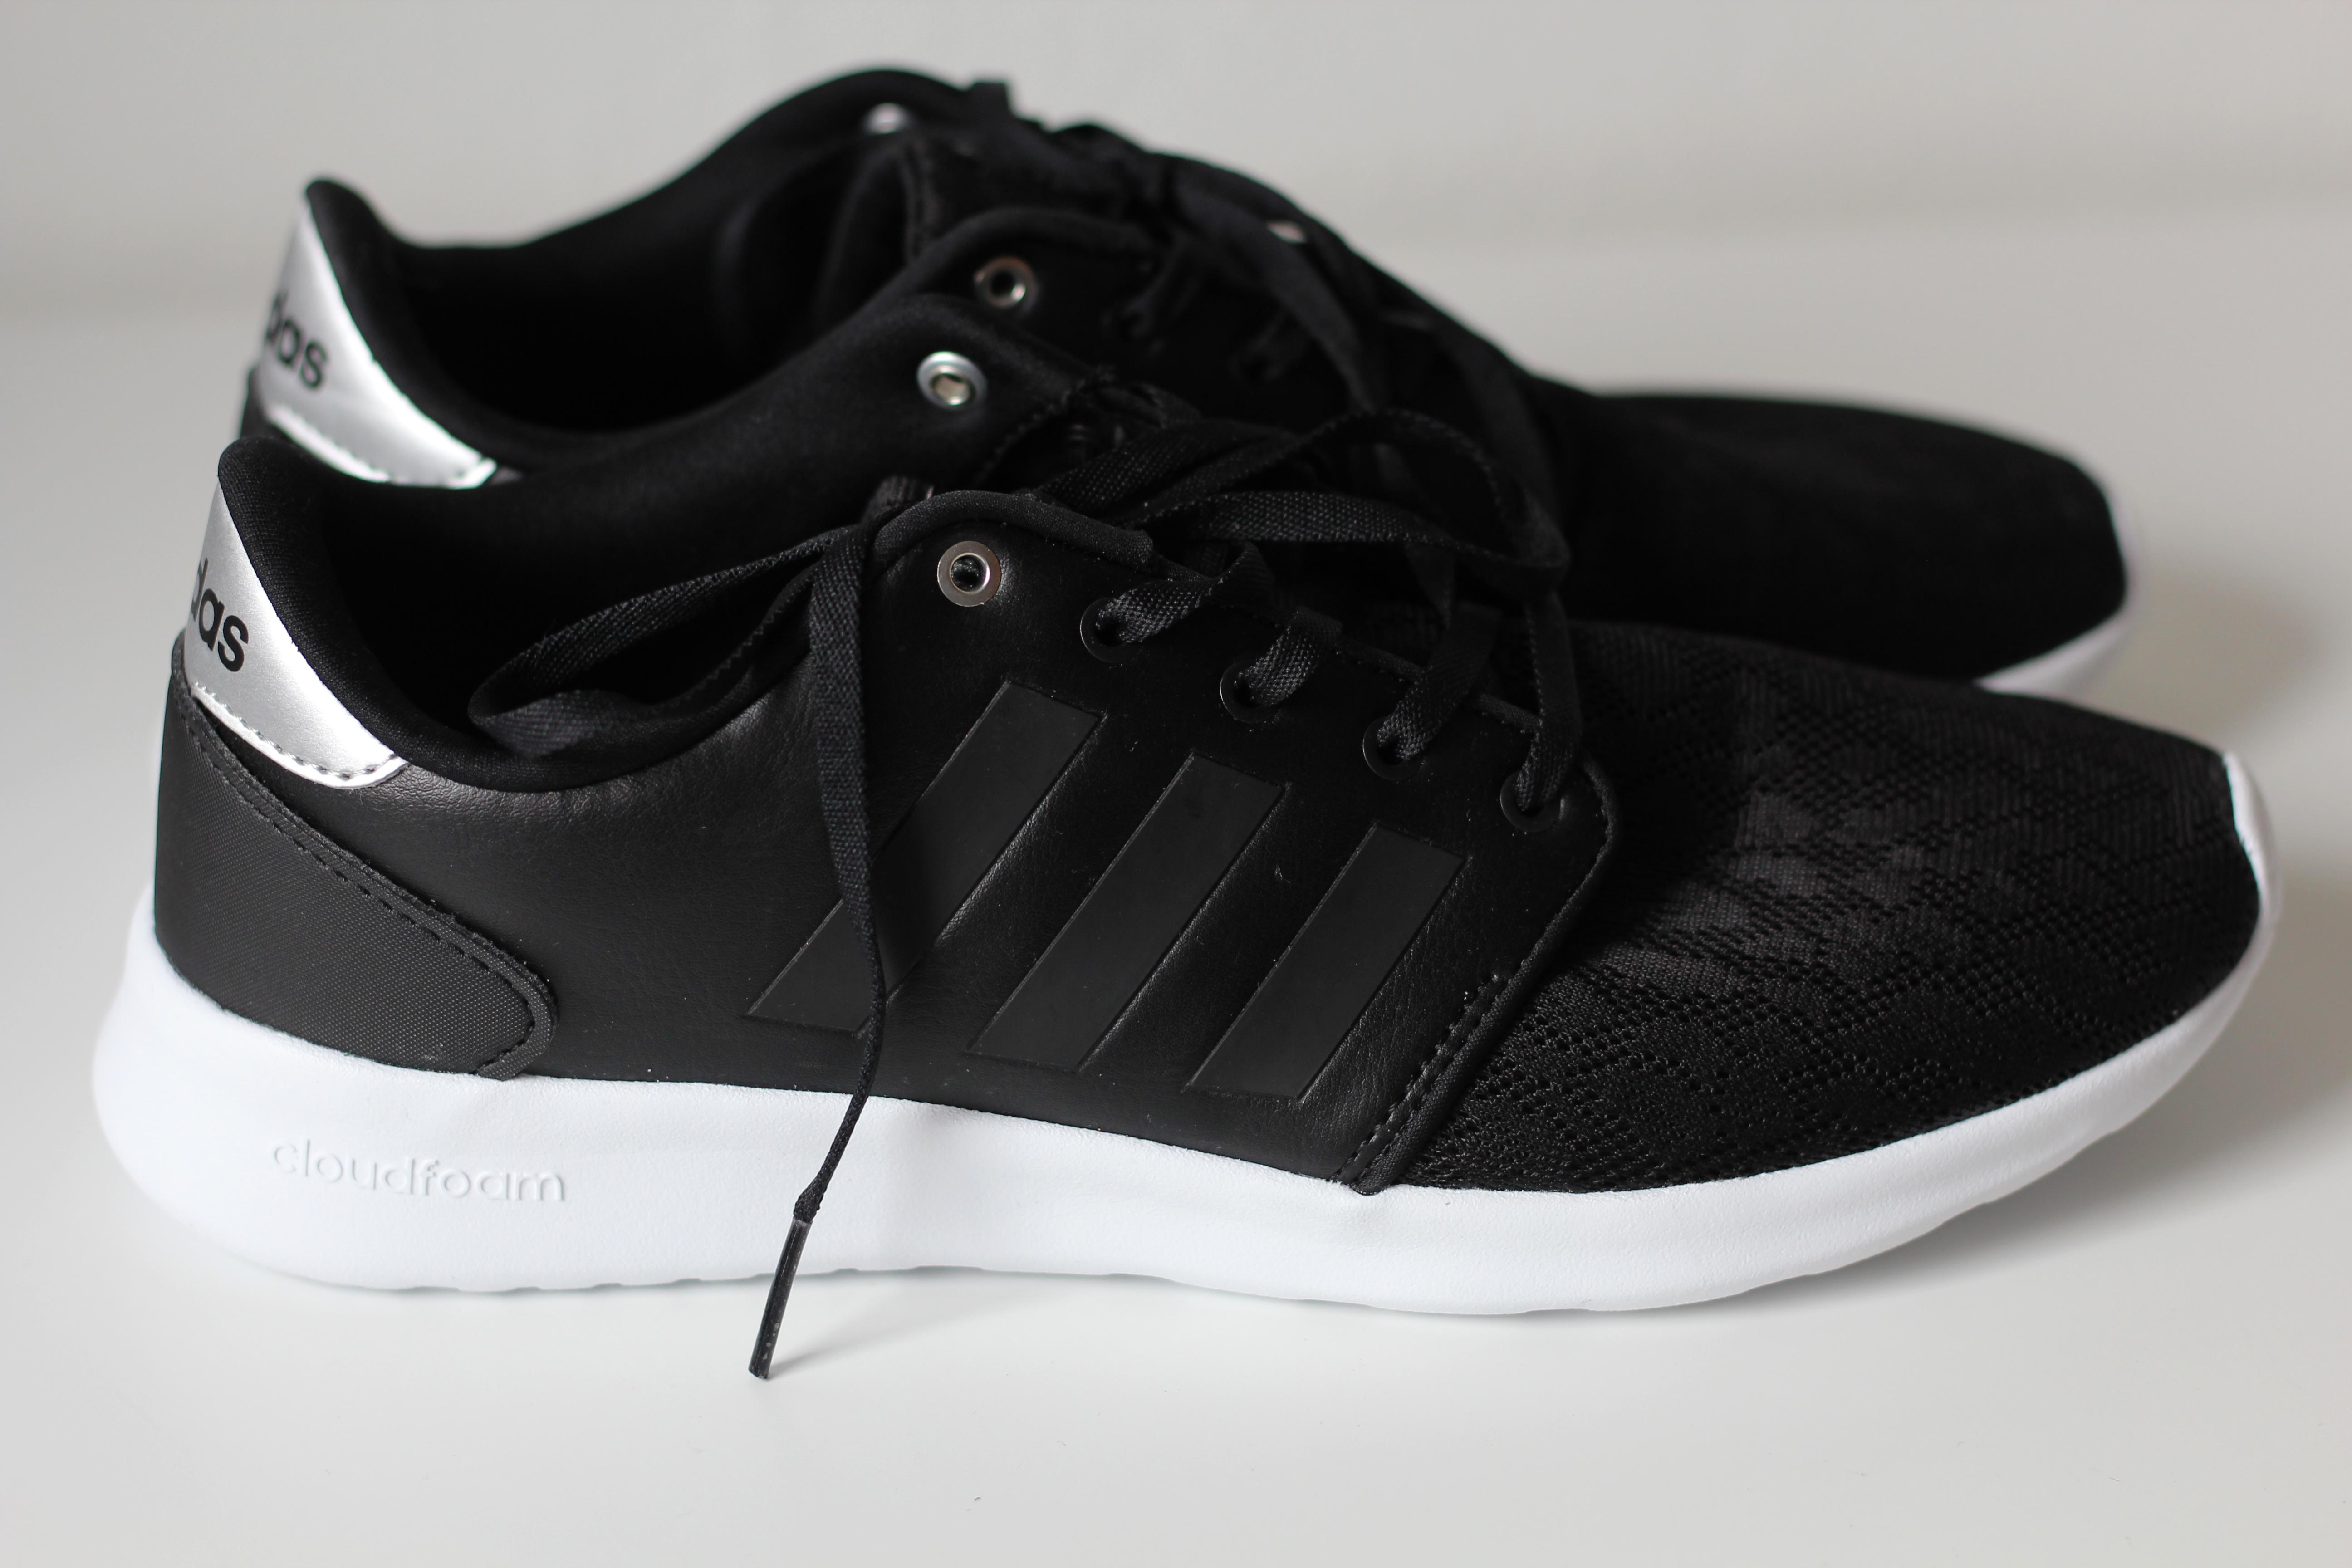 adidas Adistar Racer shoes black white